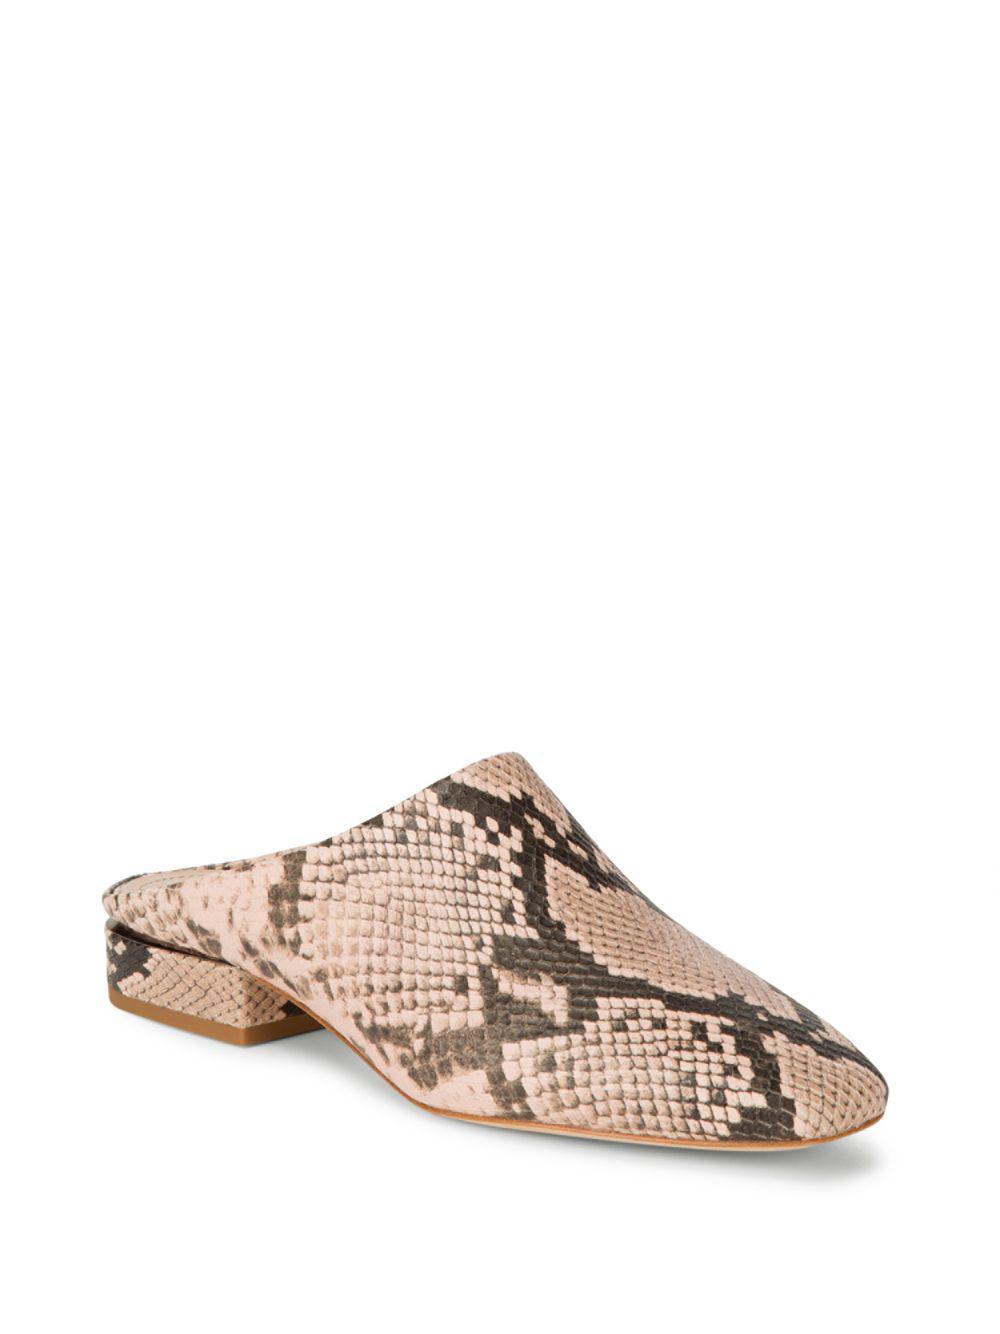 Pour La Victoire Sebina Snake Embossed Leather Slide Flat zNZjF8